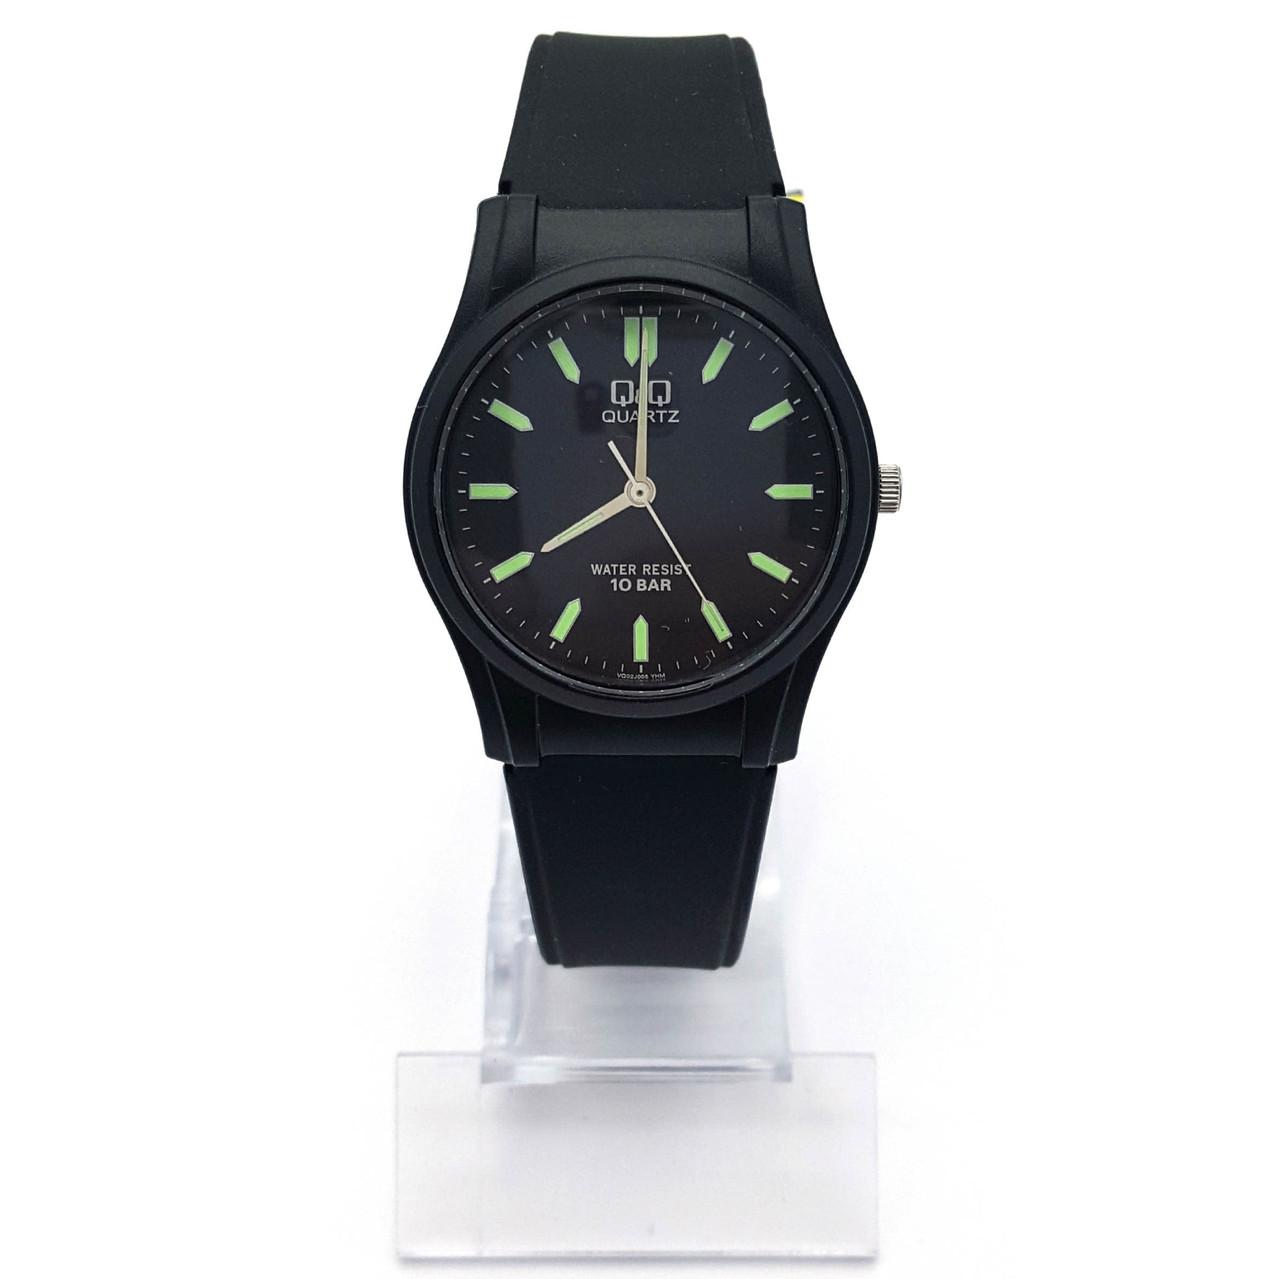 0a849689 Часы QQ Спортивные, длина ремешка 16,5-22,см, циферблат 32мм ...